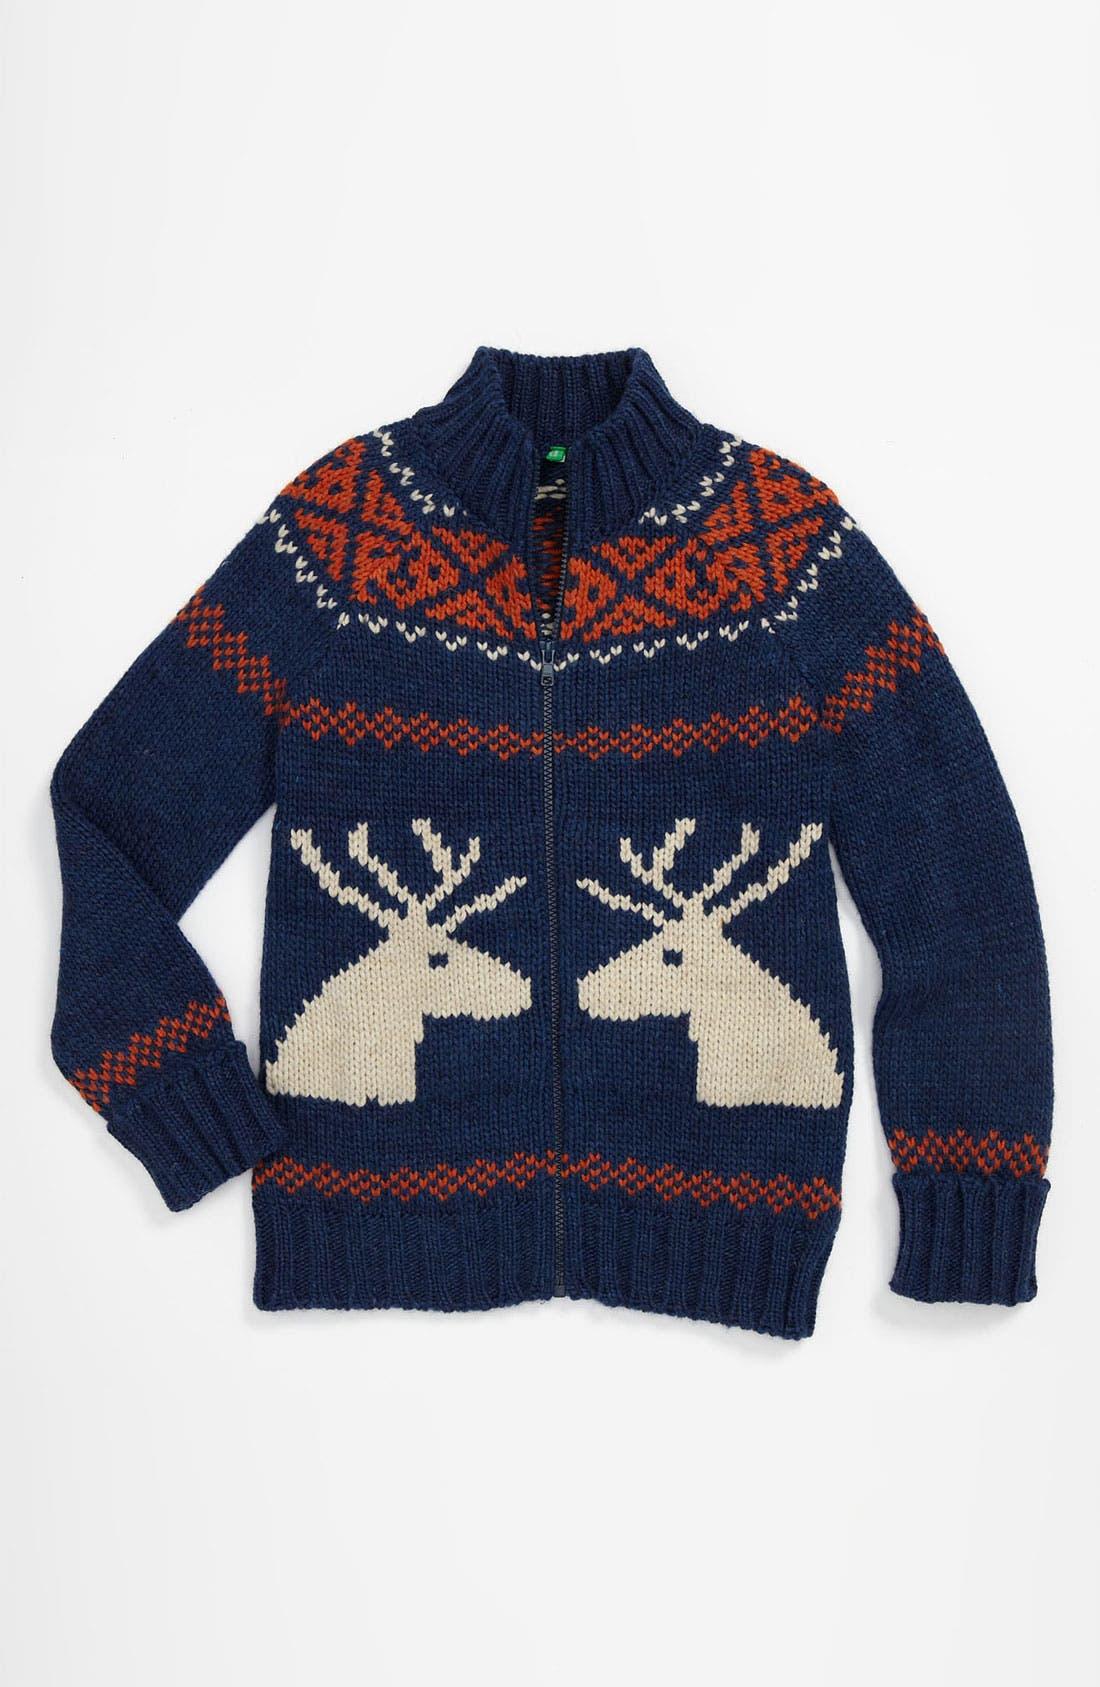 Alternate Image 1 Selected - United Colors of Benetton Kids Sweater (Little Boys & Big Boys)